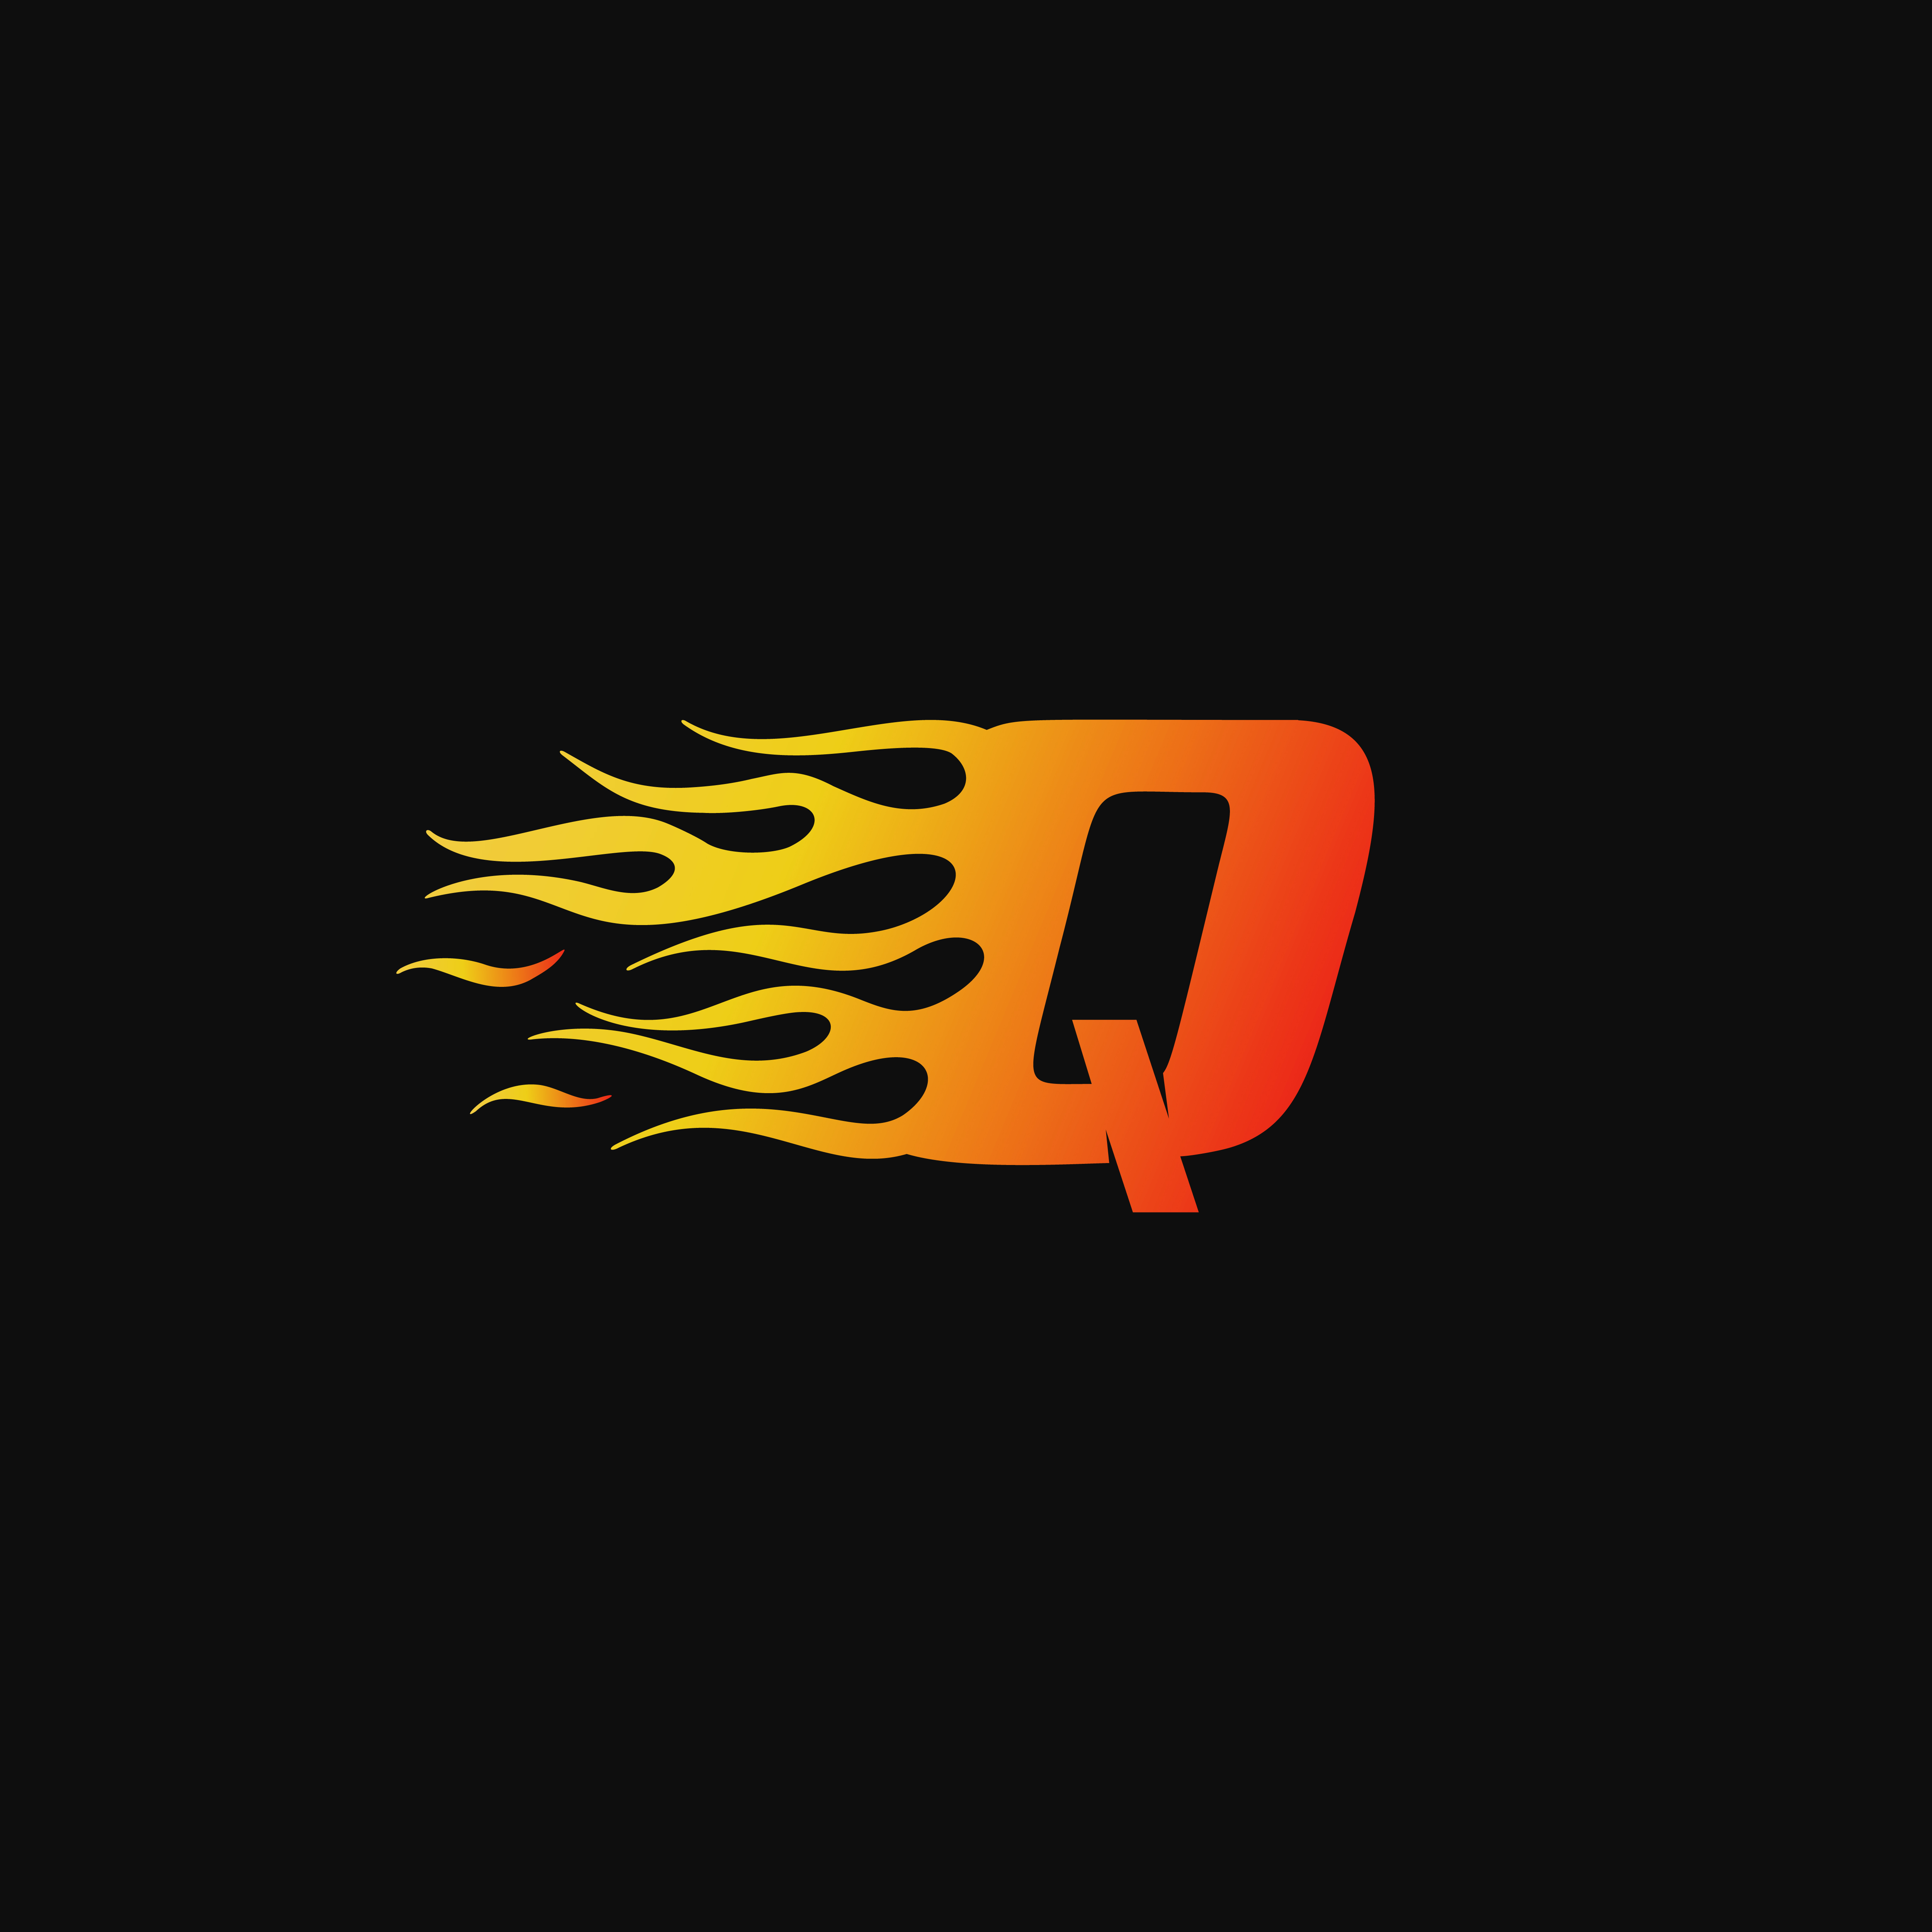 Speed Car Logo Template: Letter Q Burning Flame Logo Design Template 588100 Vector